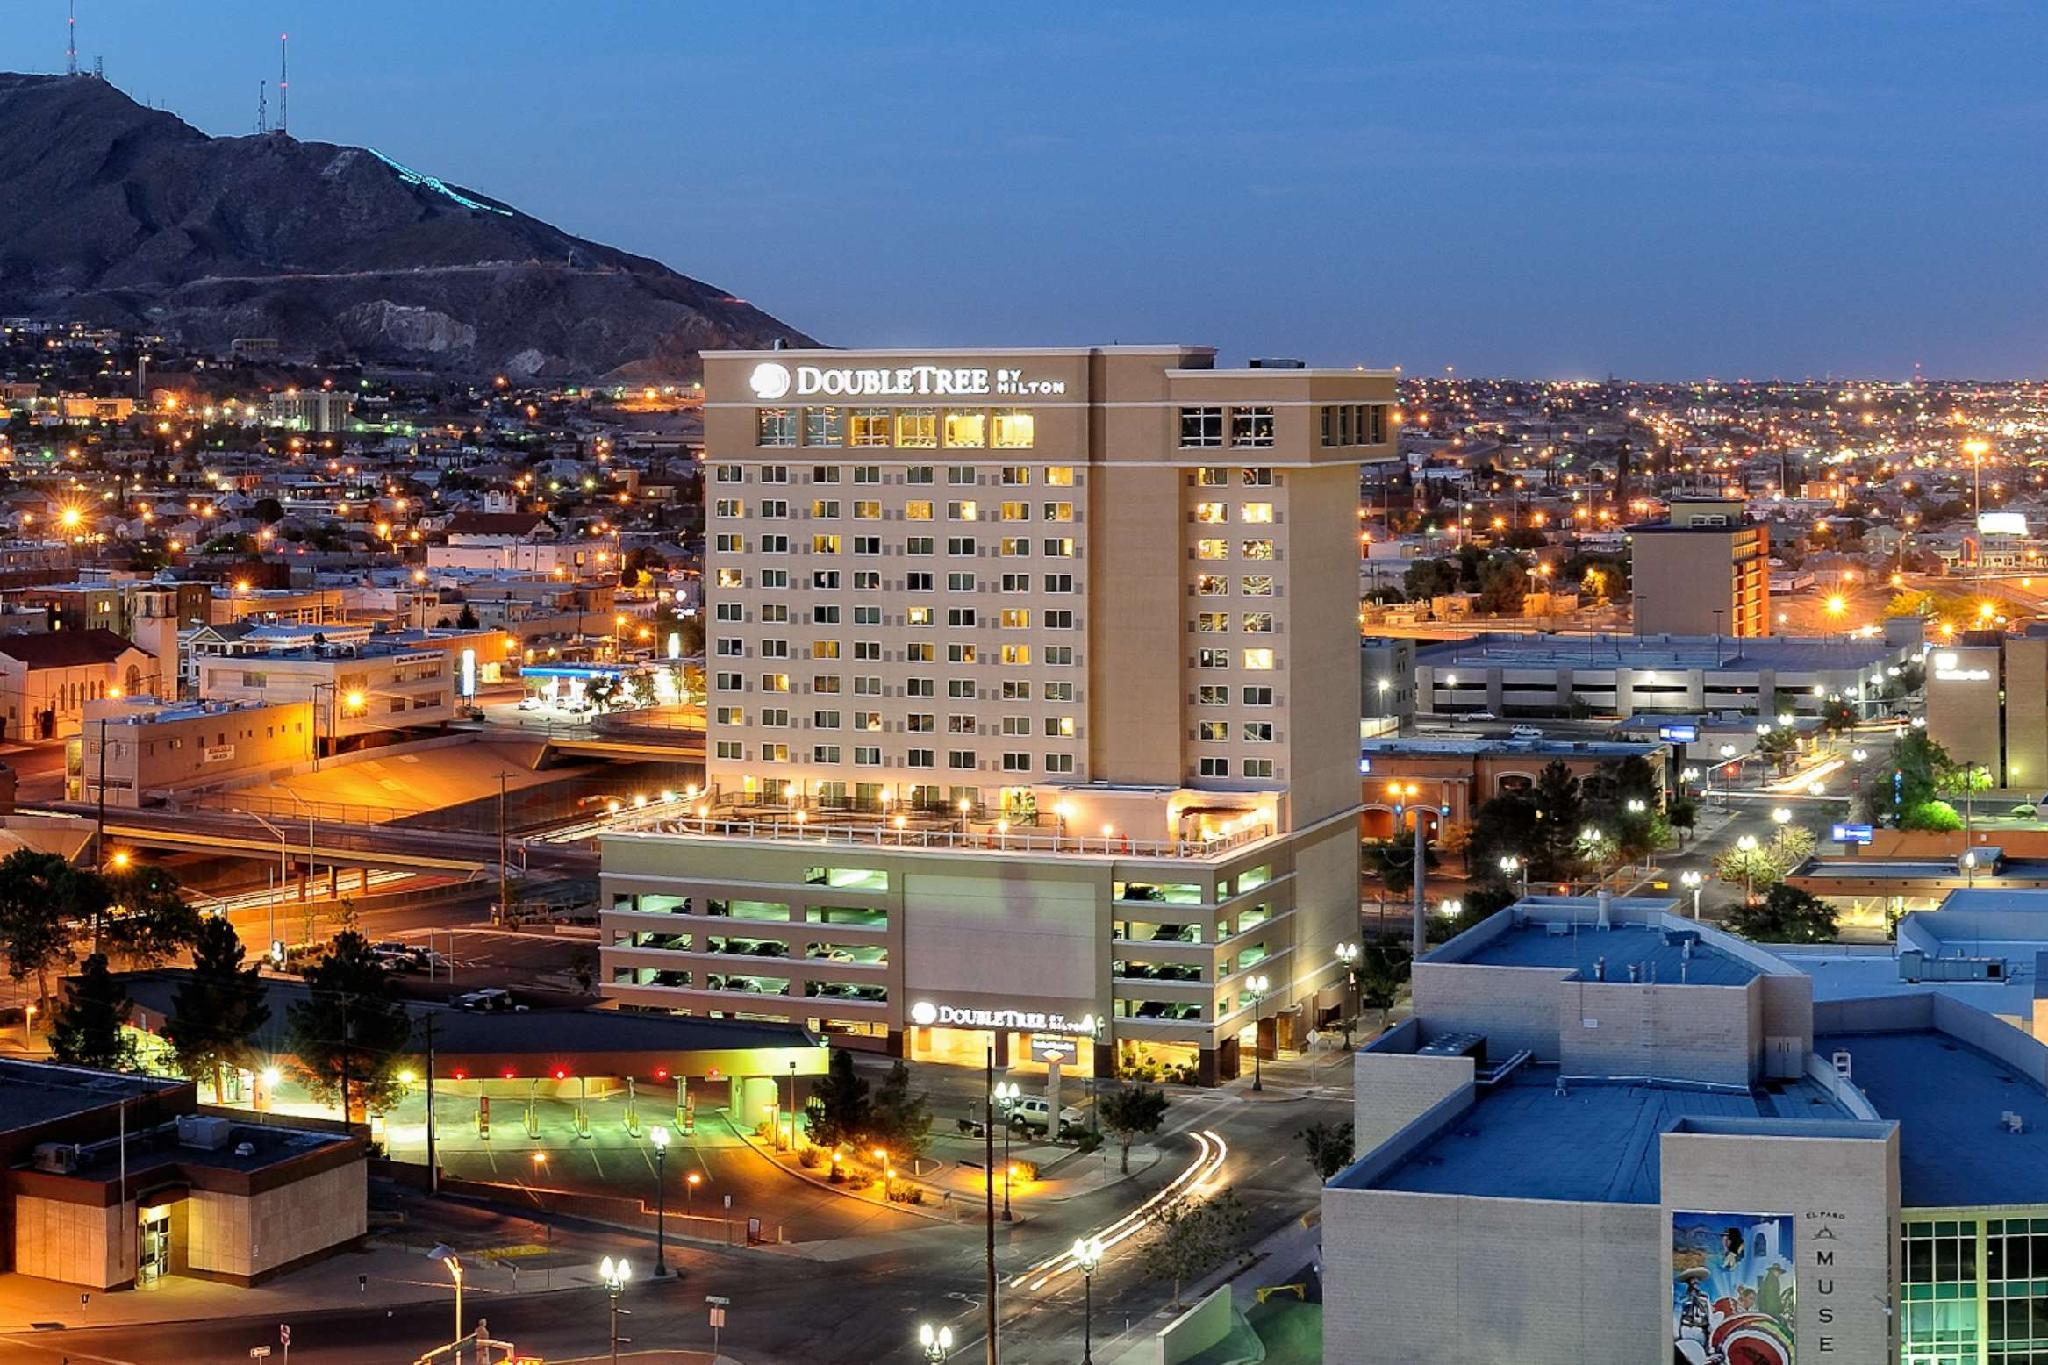 Doubletree El Paso Downtown City Center Hotel